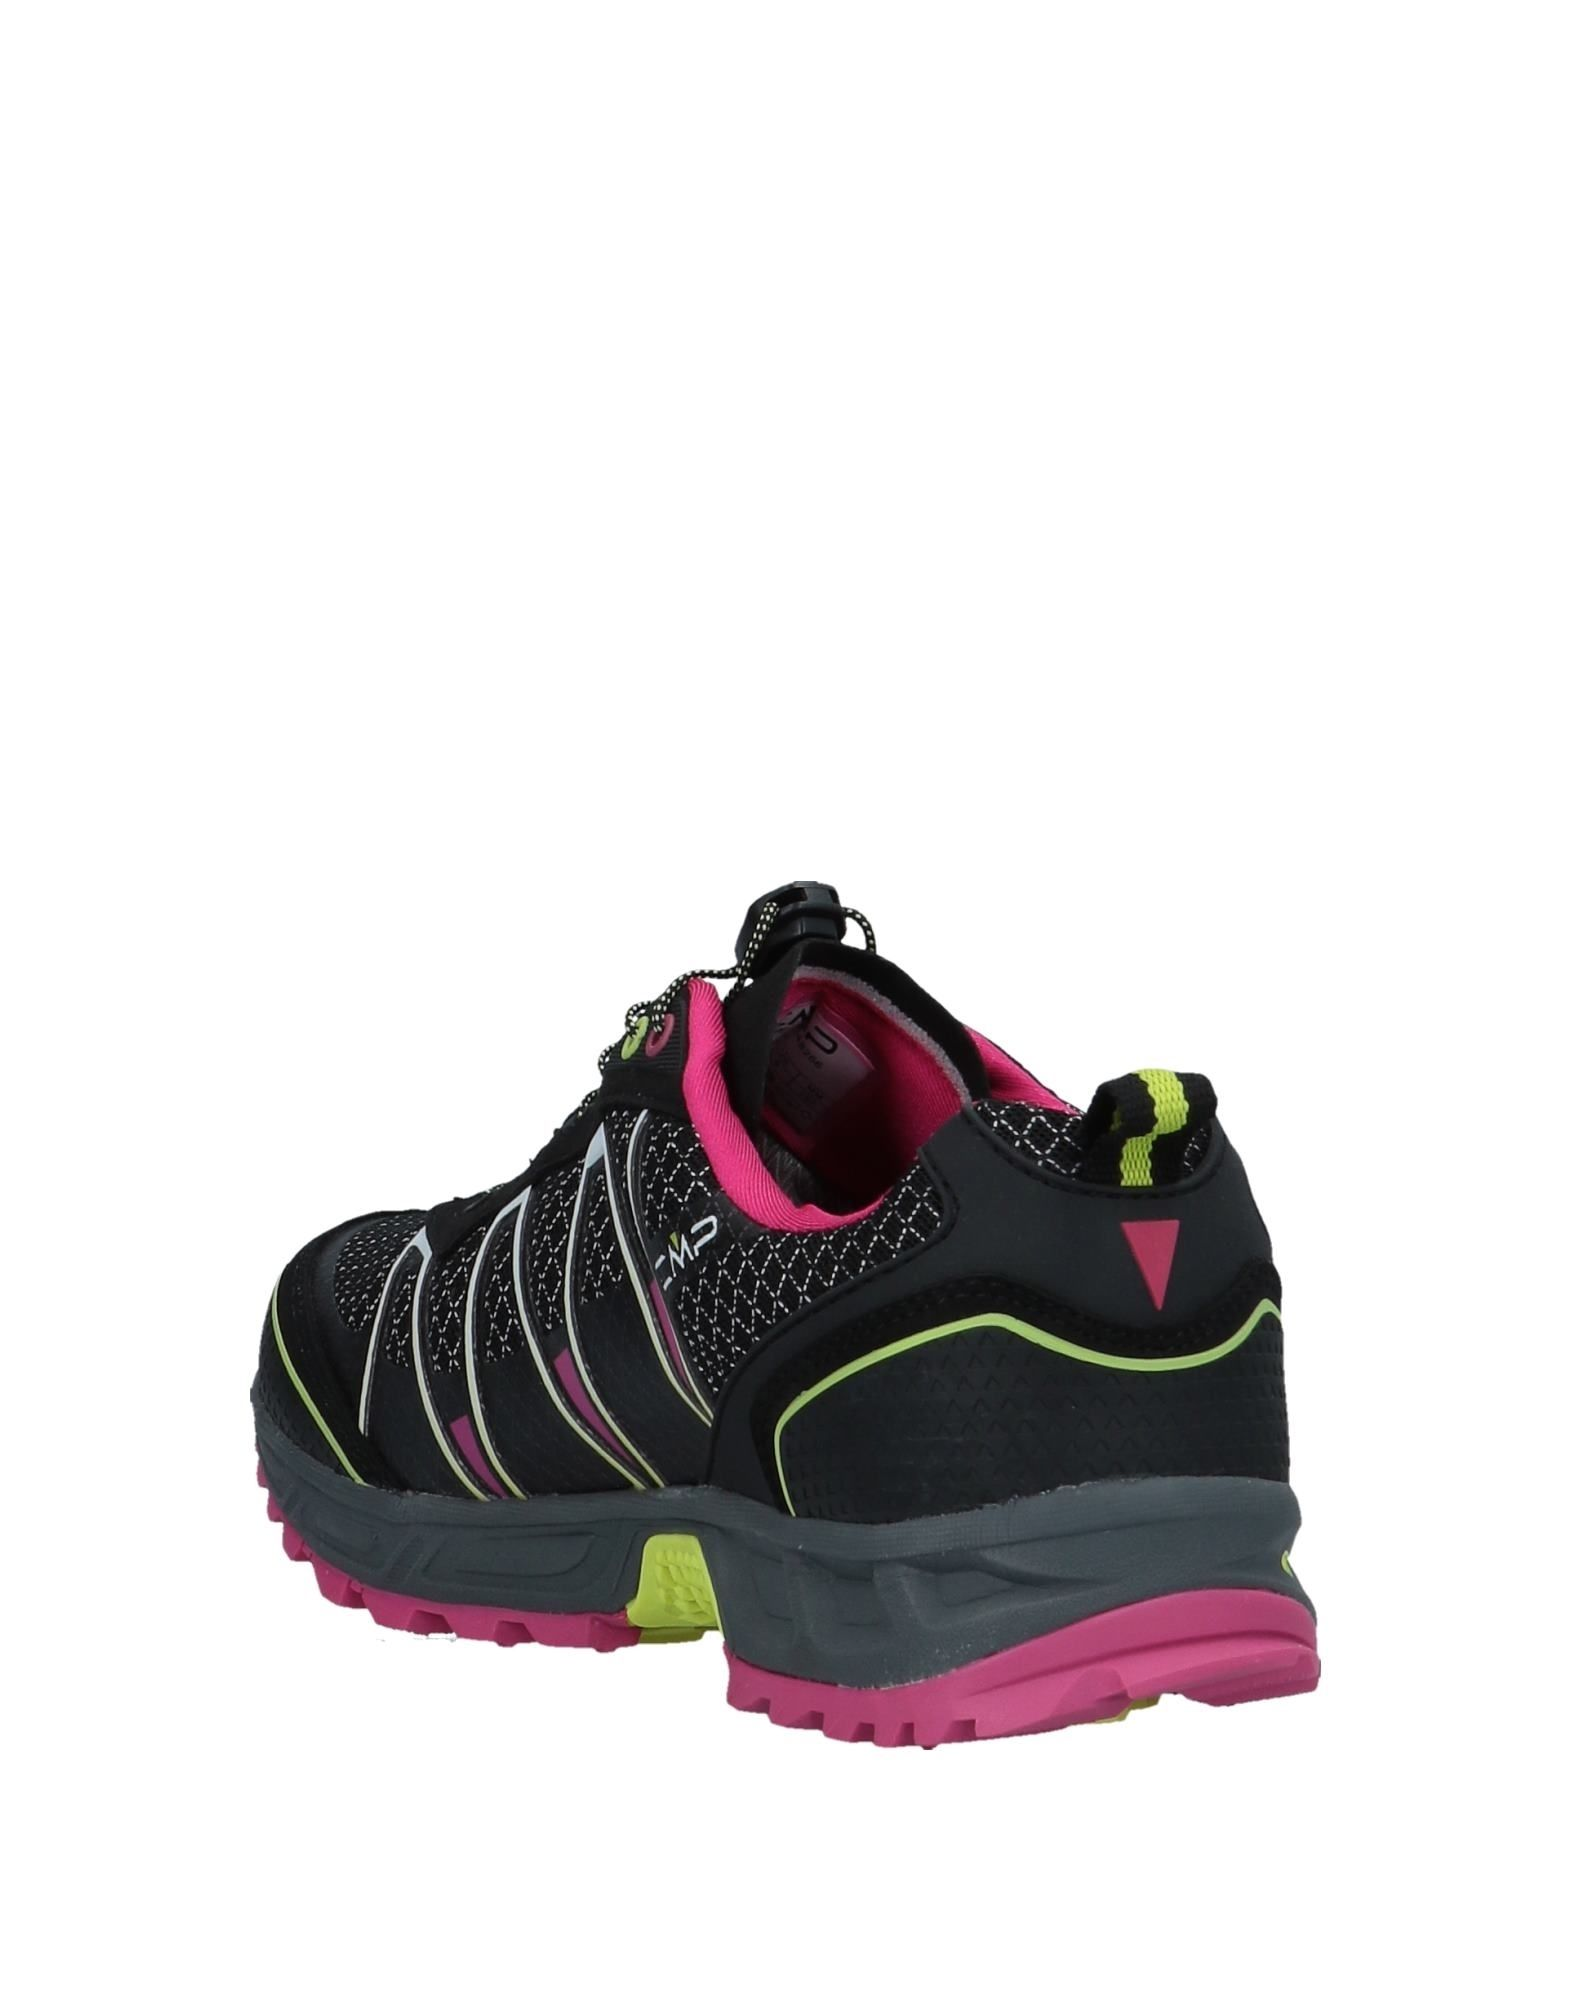 Cmp By F.Lli Qualität Campagnolo Sneakers Damen  11537423XO Gute Qualität F.Lli beliebte Schuhe 4ccf82